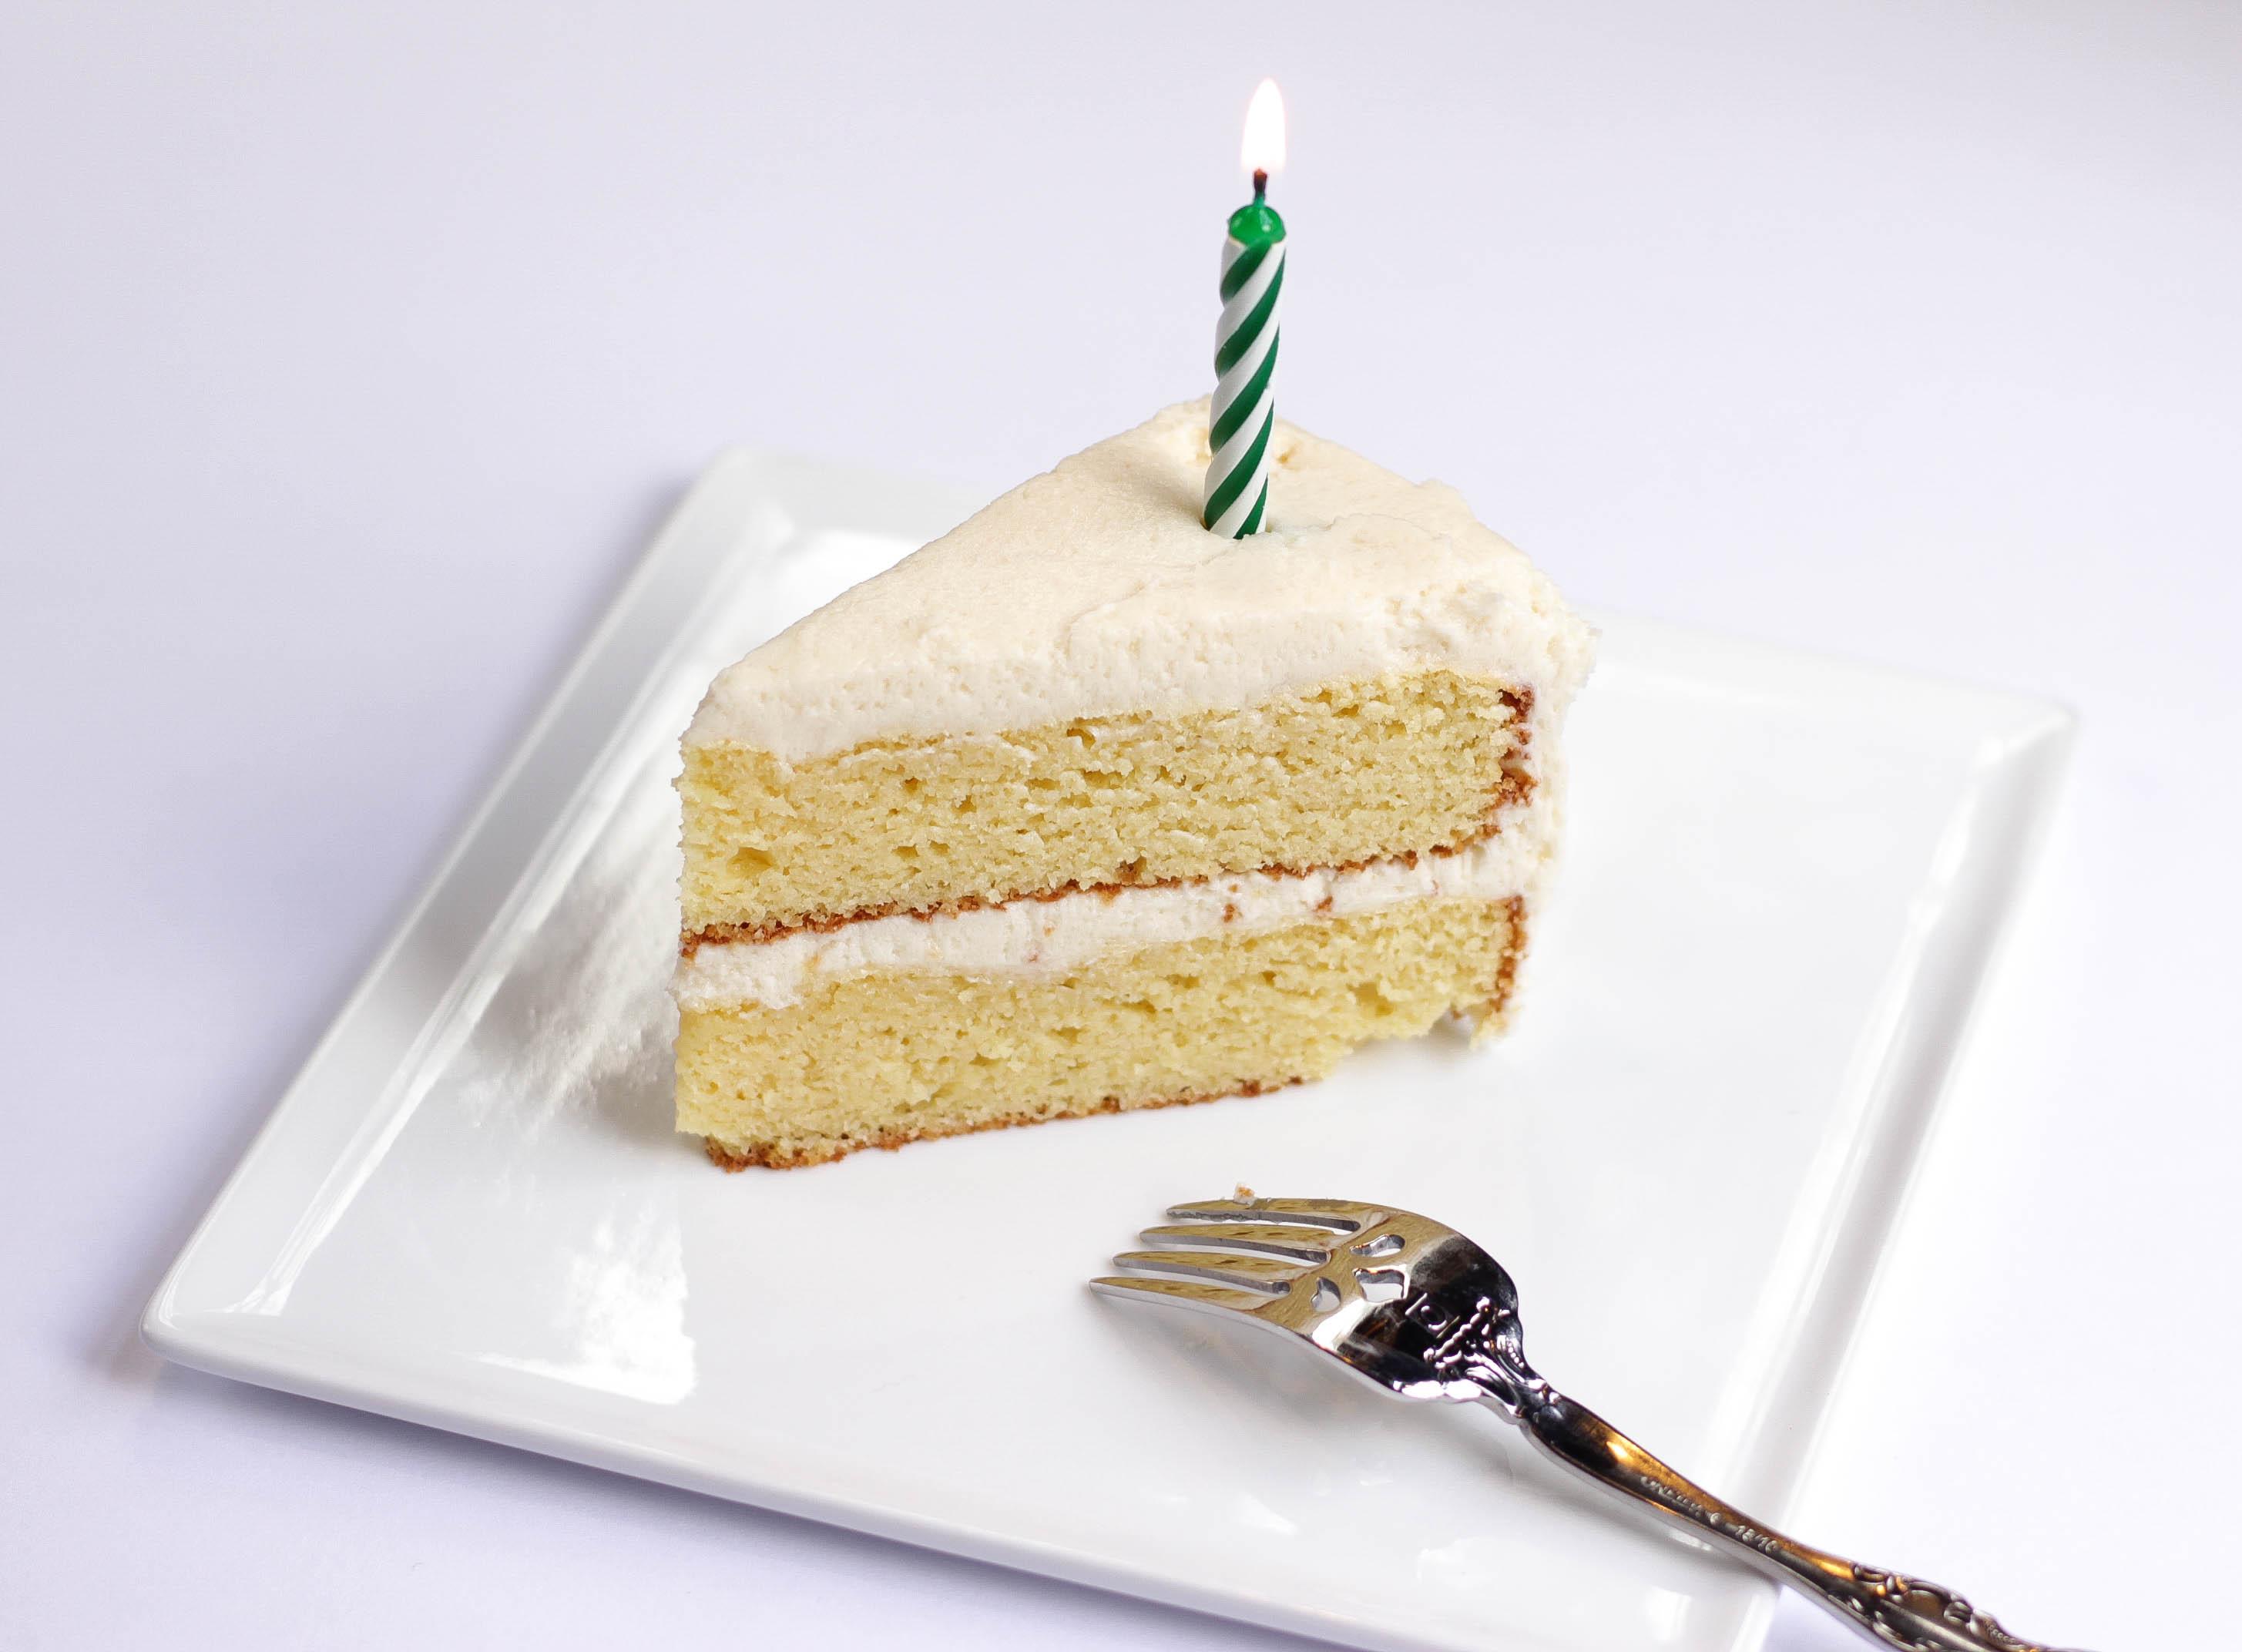 Keto Cake Recipe Vanilla: Keto Vanilla Cake With Buttercream Frosting